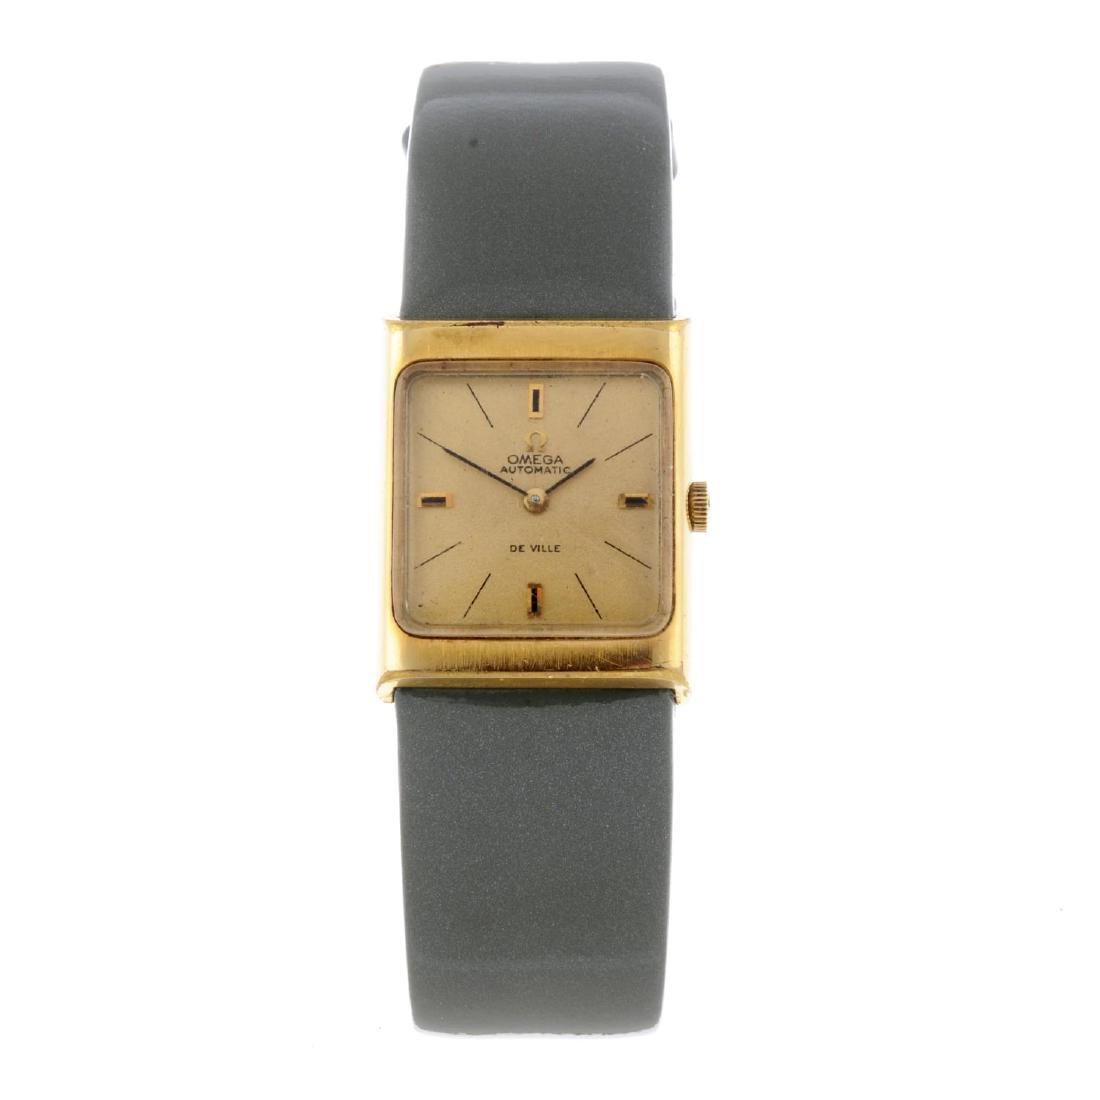 OMEGA - a lady's De Ville wrist watch. Gold plated case